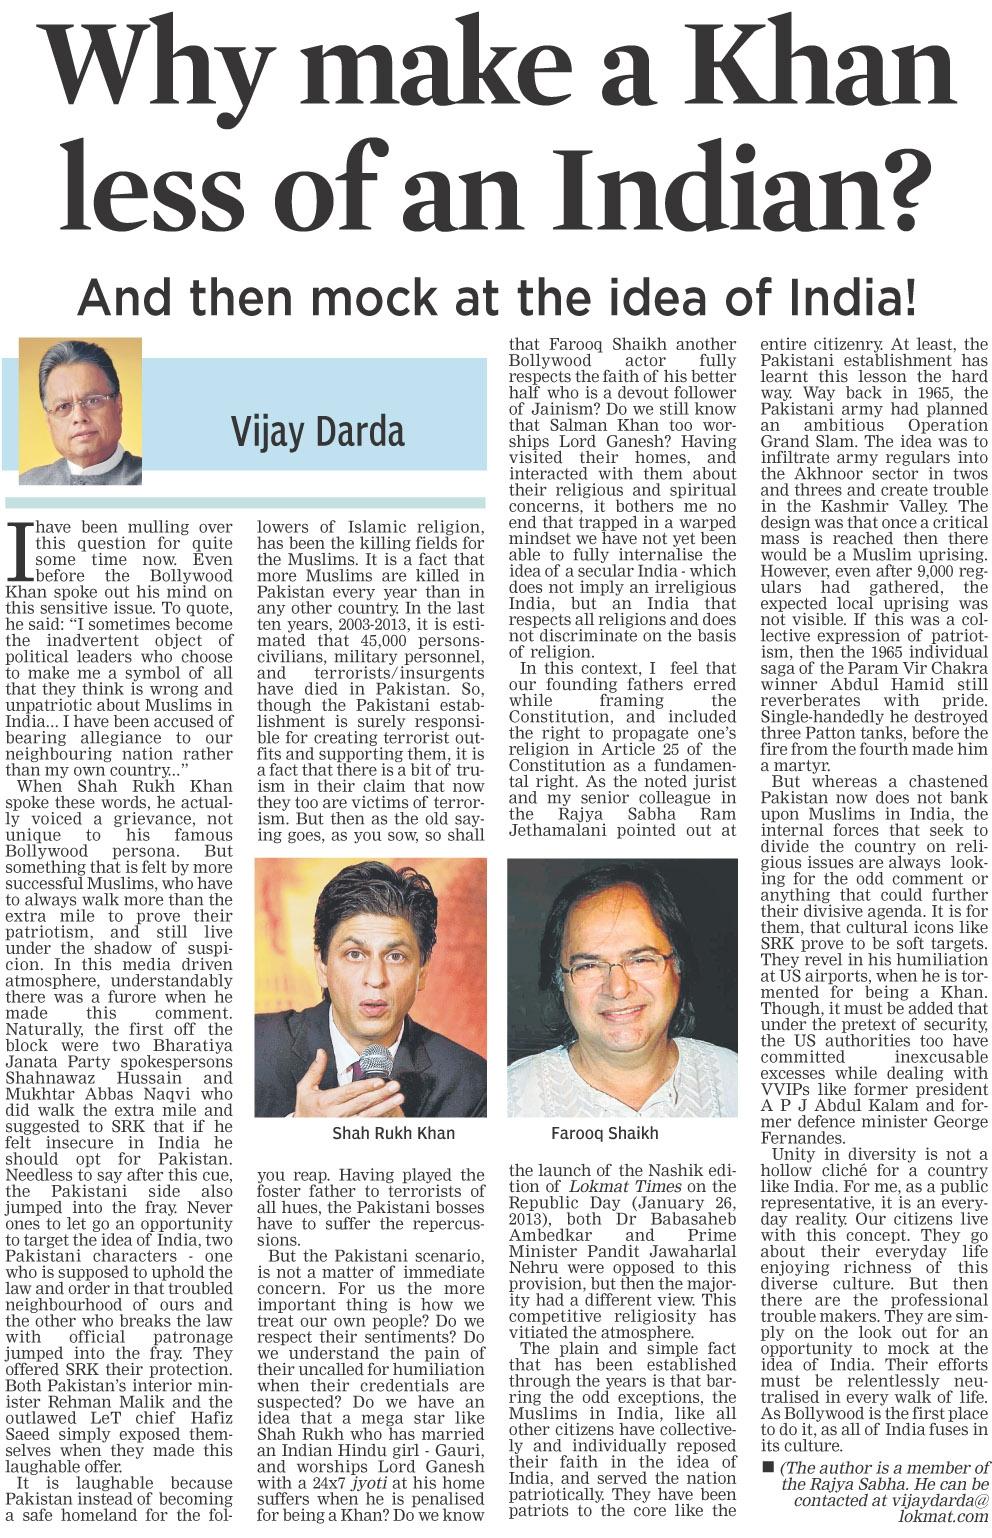 Why make a Khan less of an Indian?